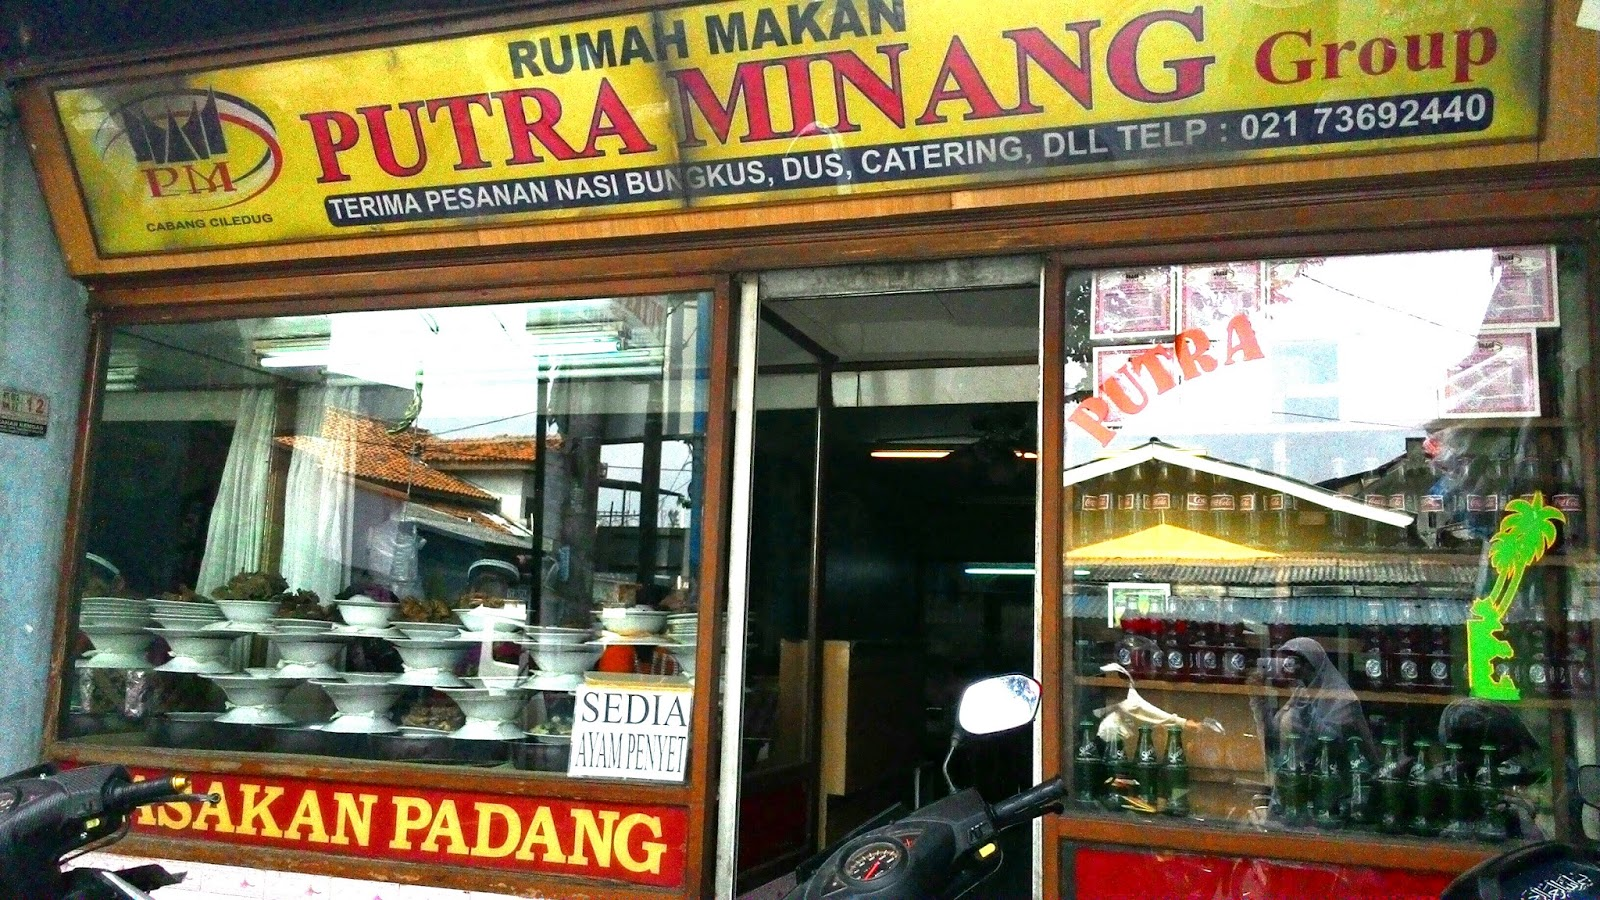 Ikaaikah Topik Rumah Makan Padang